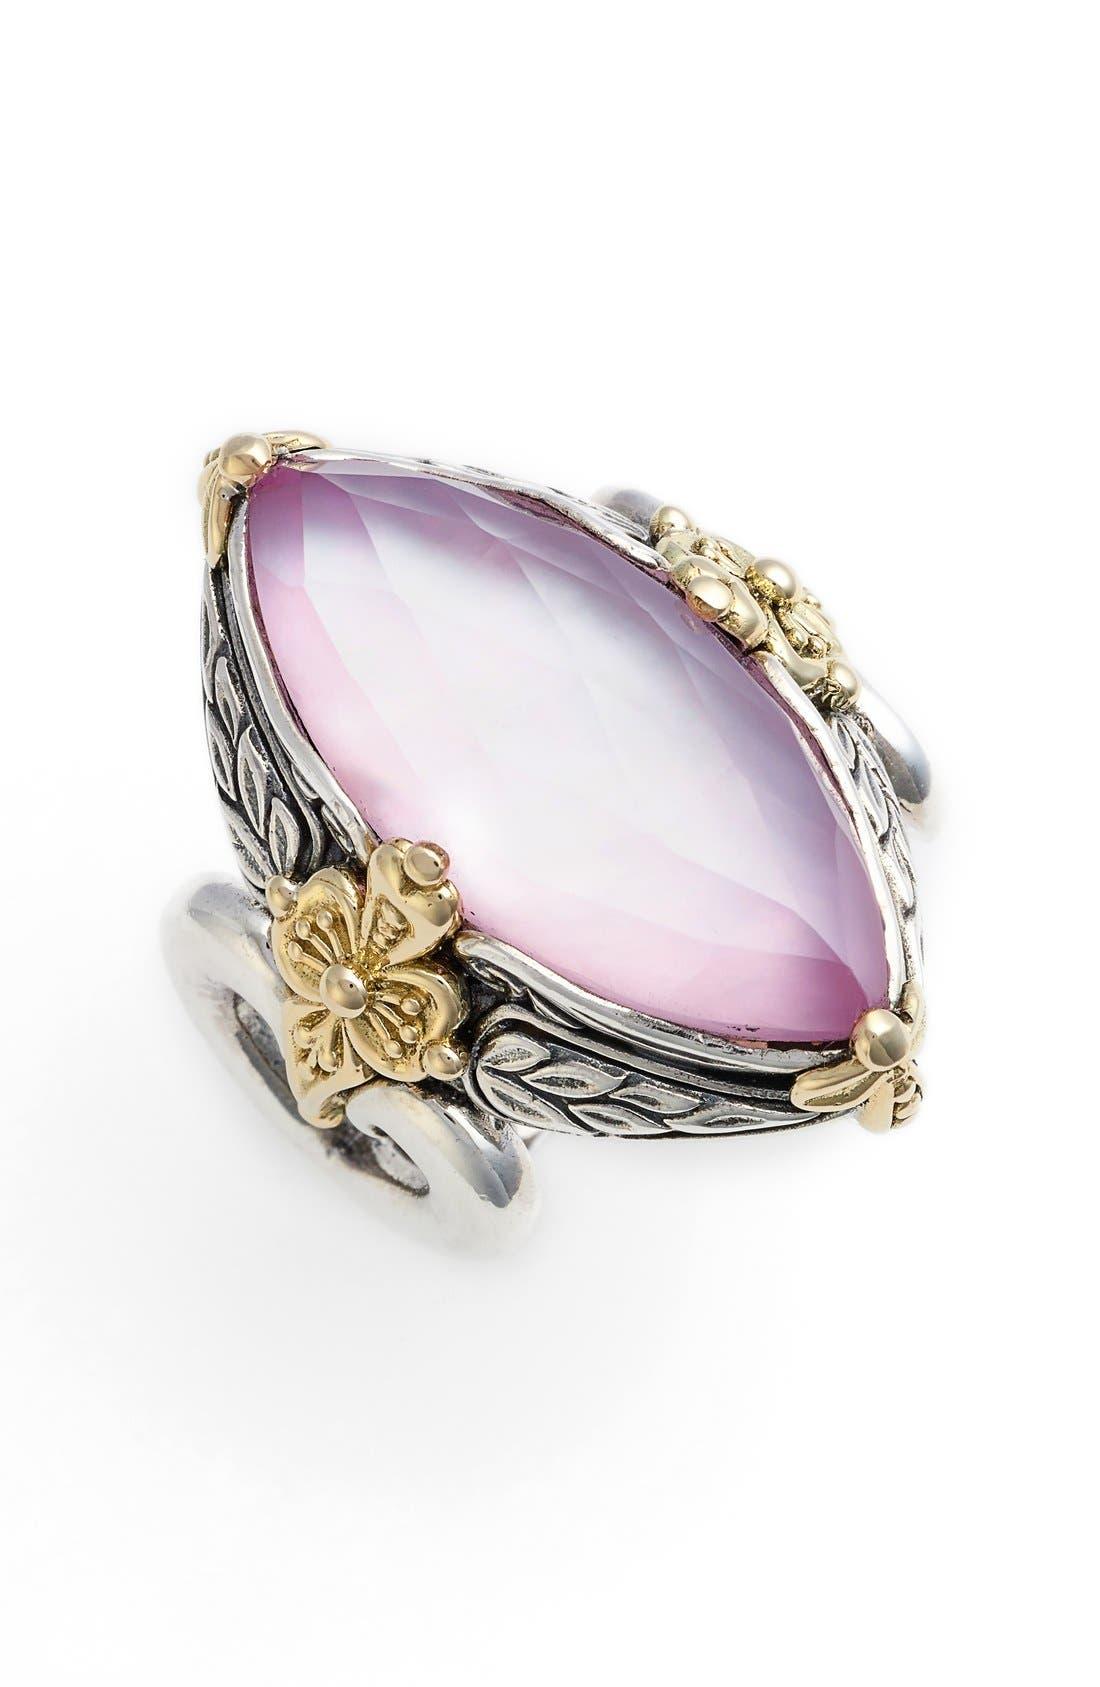 Konstantino 'Iliada' Marquise Doublet Ring